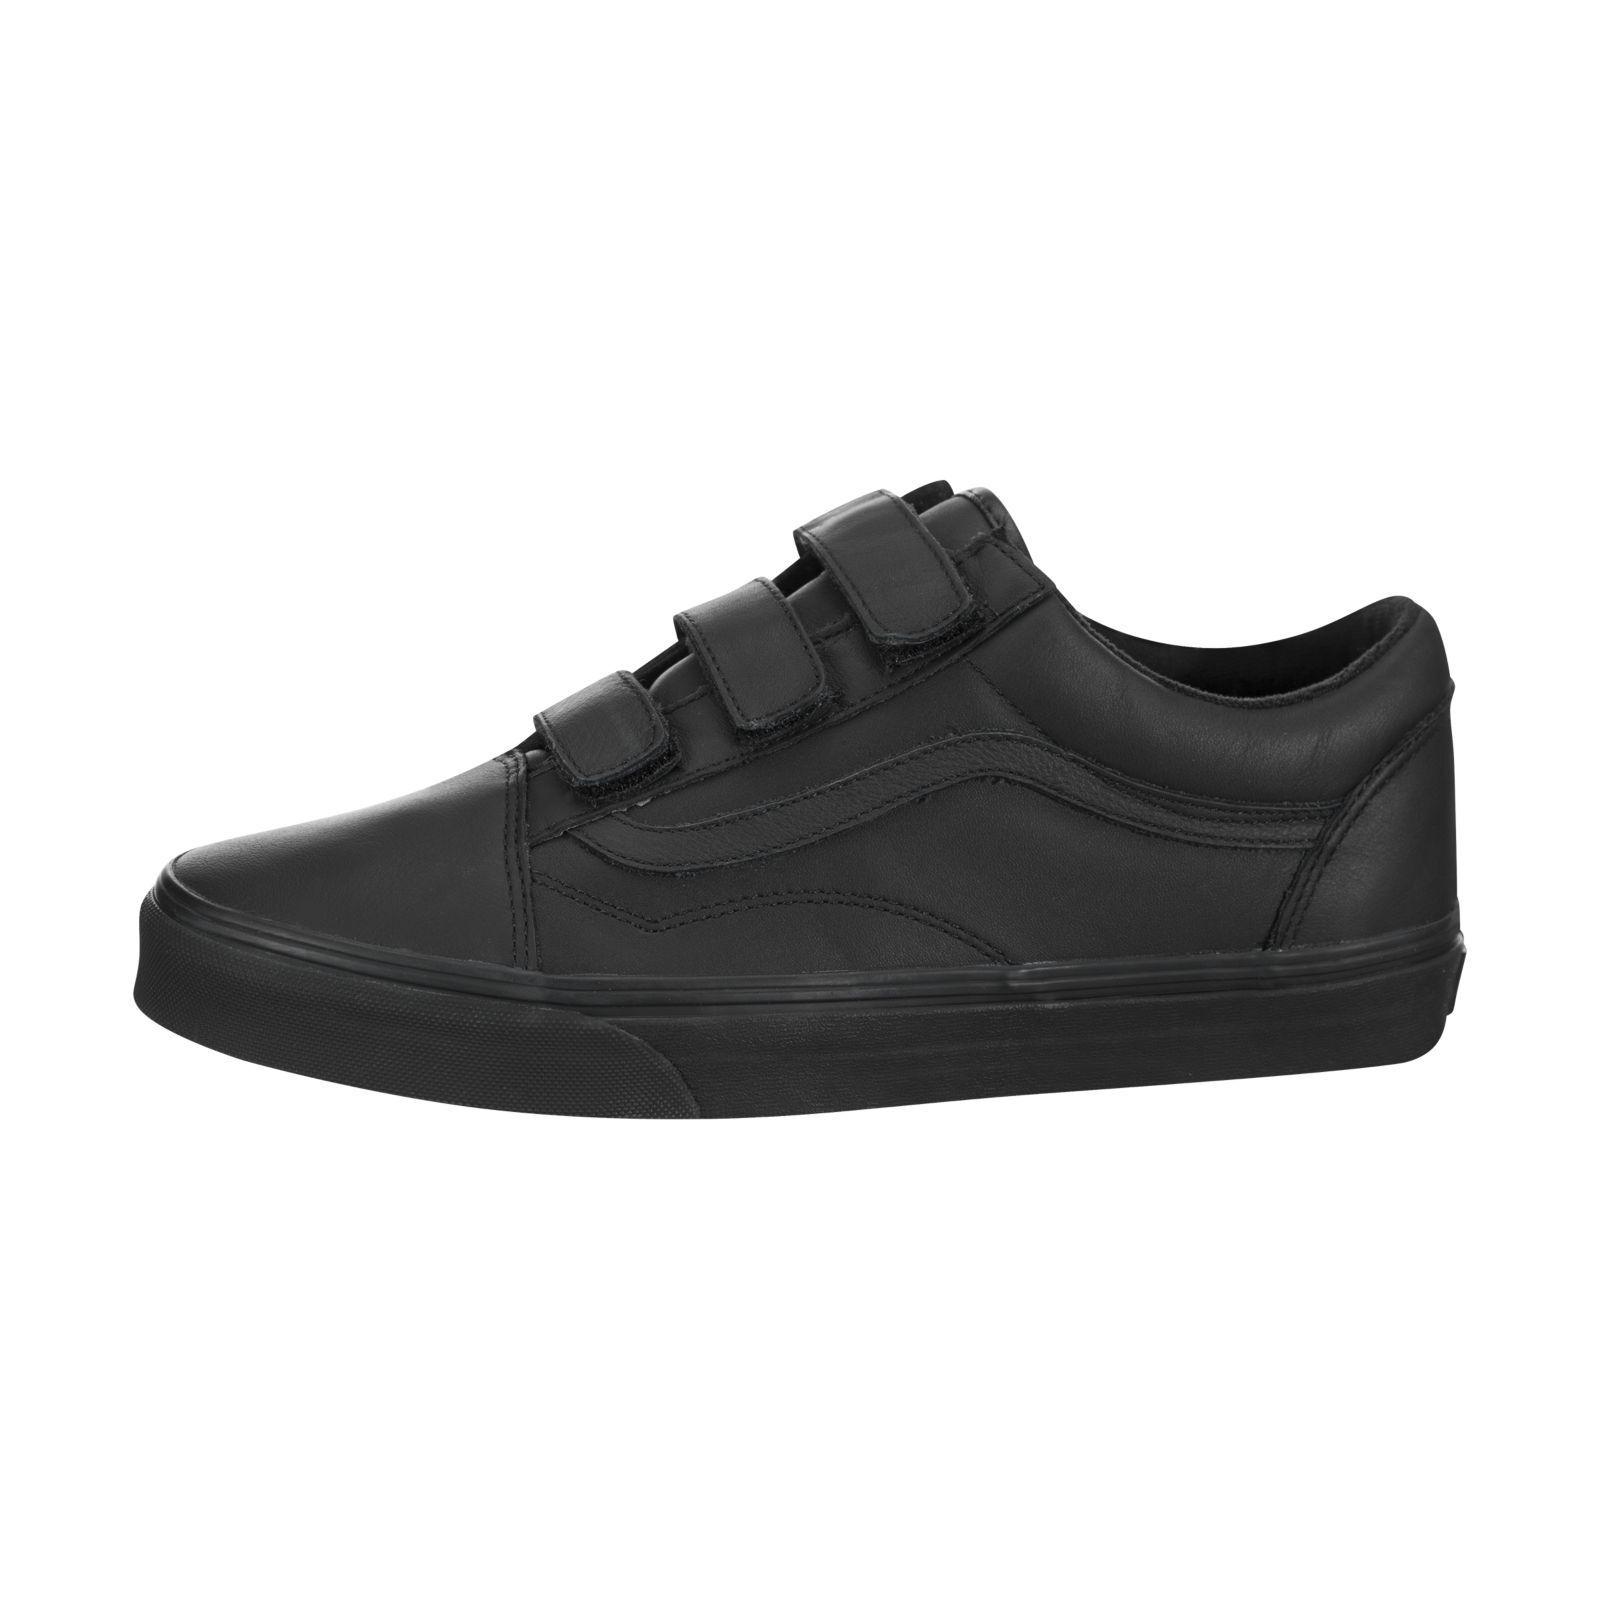 Vans Old Skool Velcro (Mono Leather)